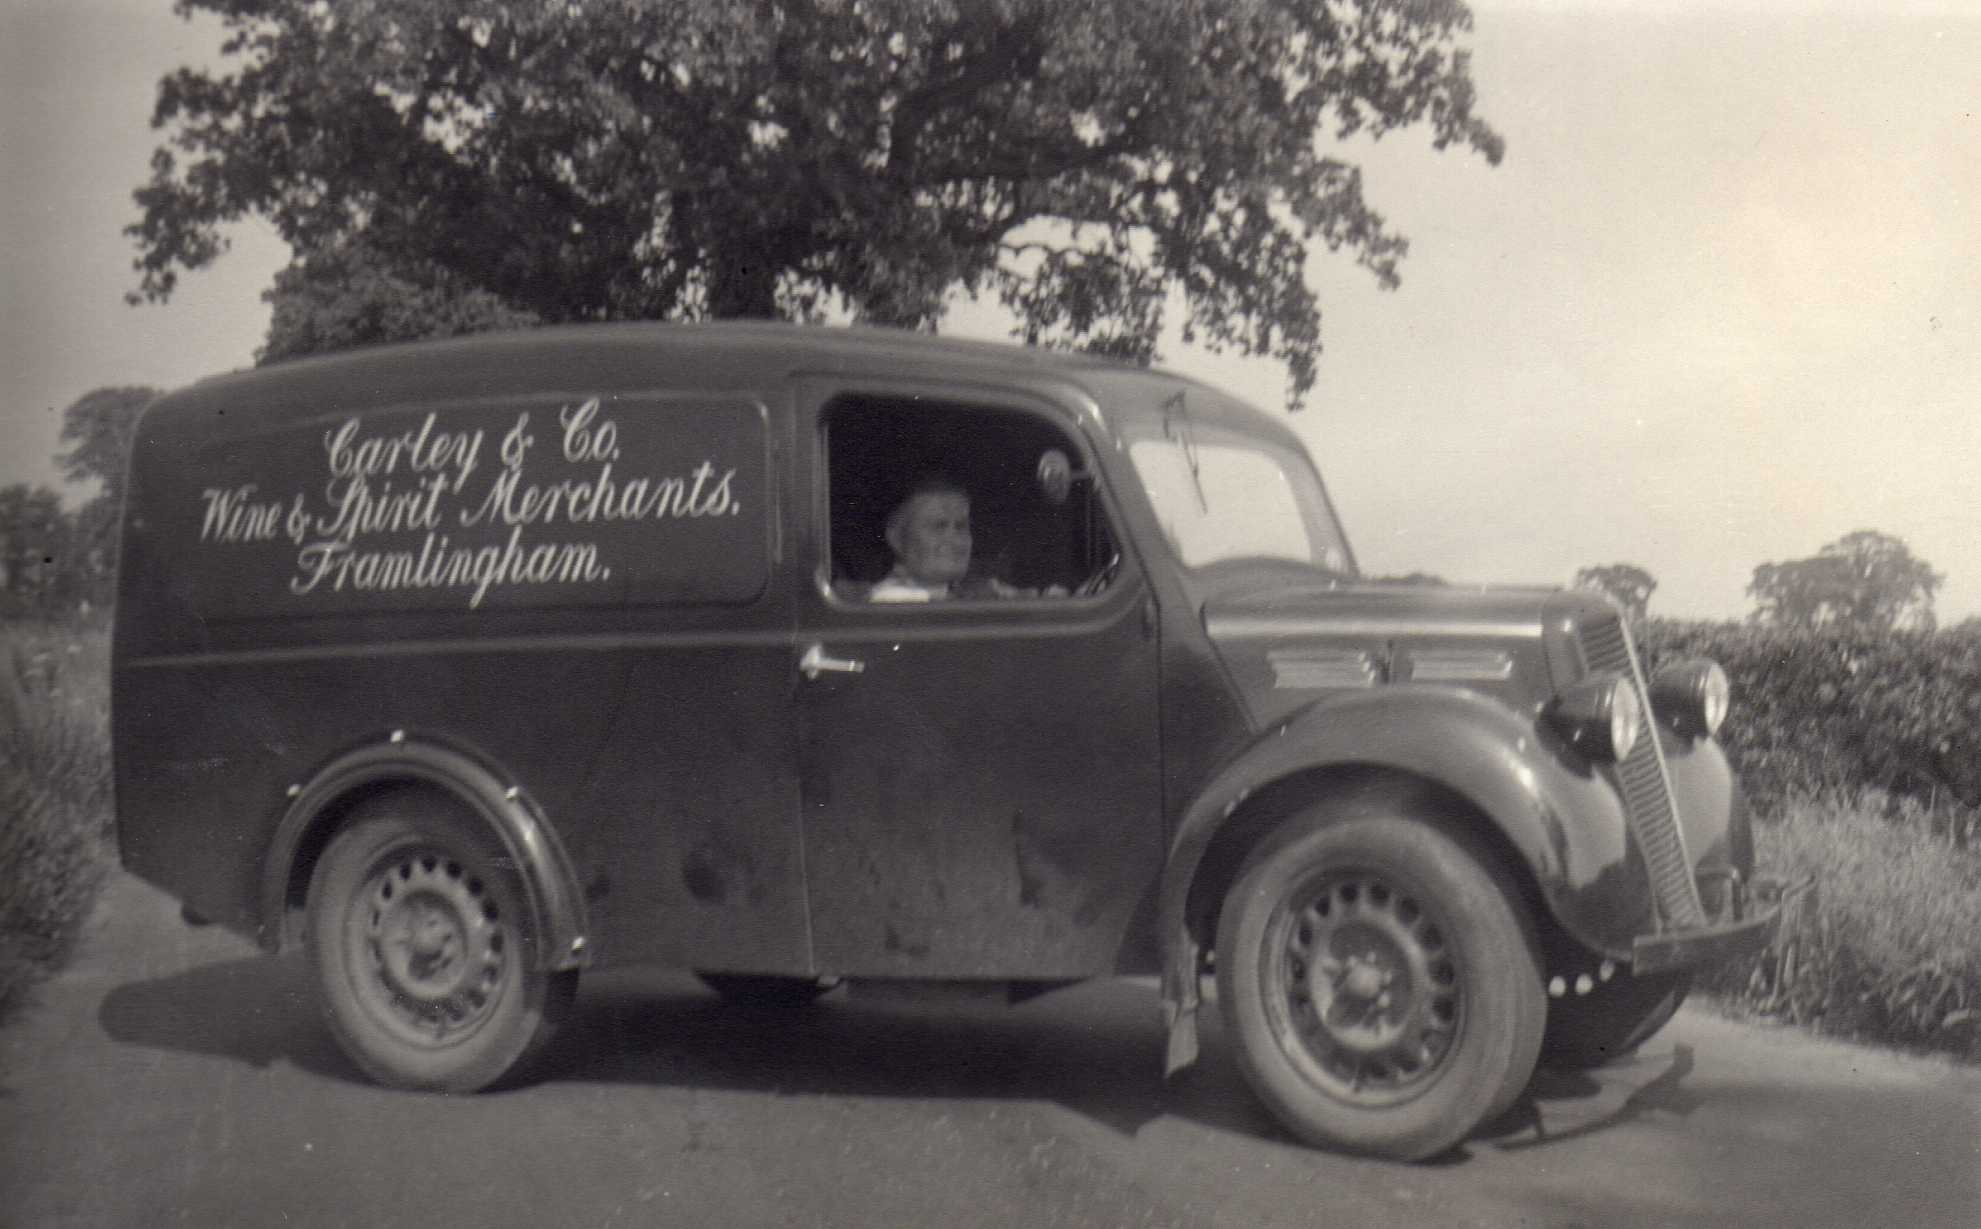 Carley's Delivery Van